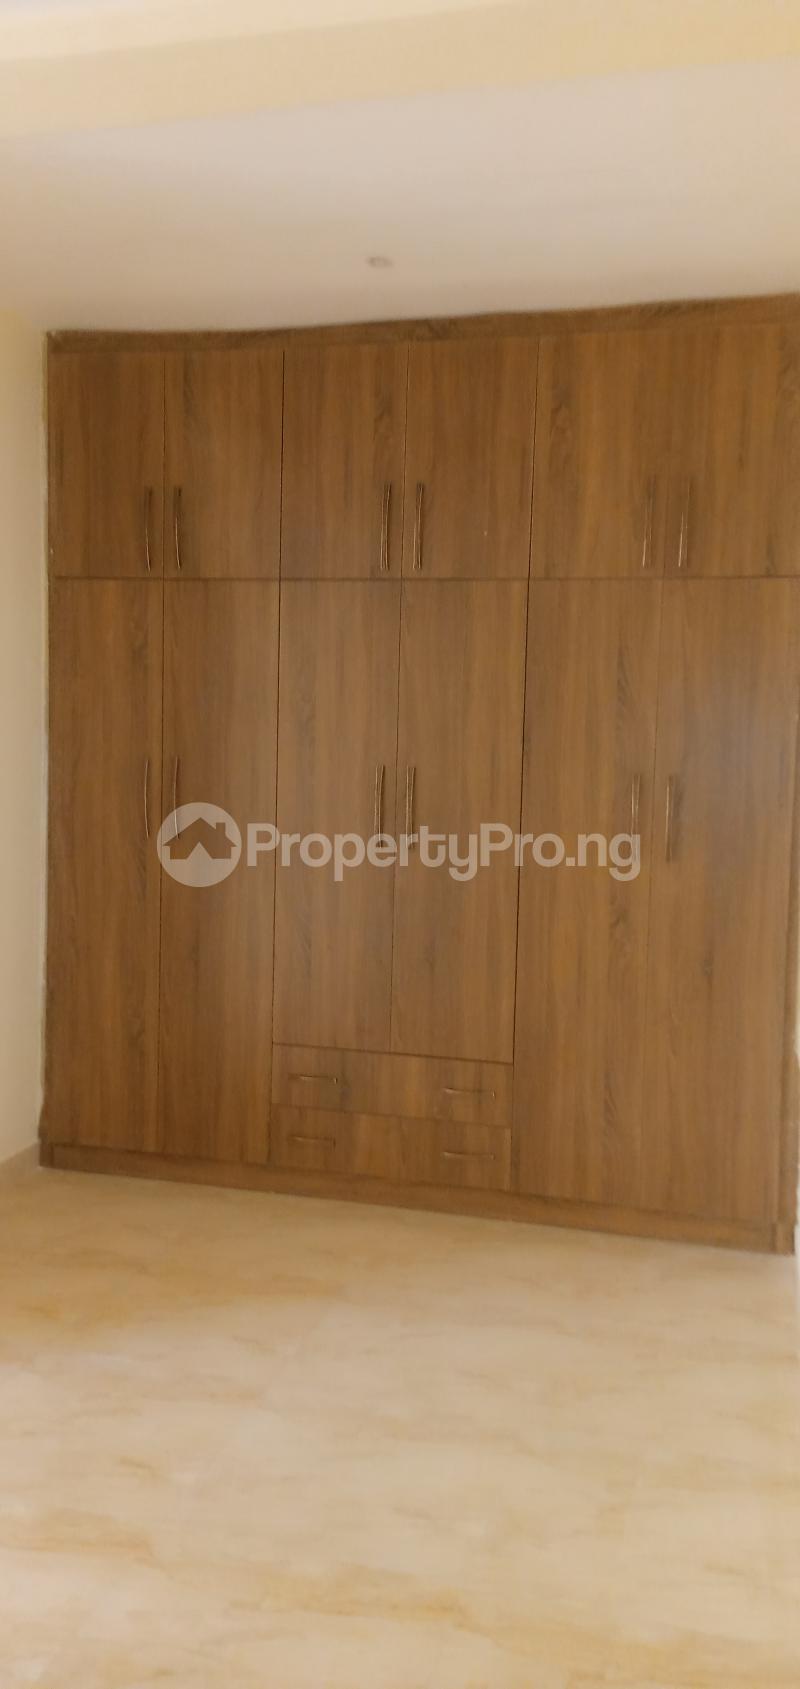 4 bedroom Terraced Duplex House for sale Close To Nnpc Guzape Guzape Abuja - 6